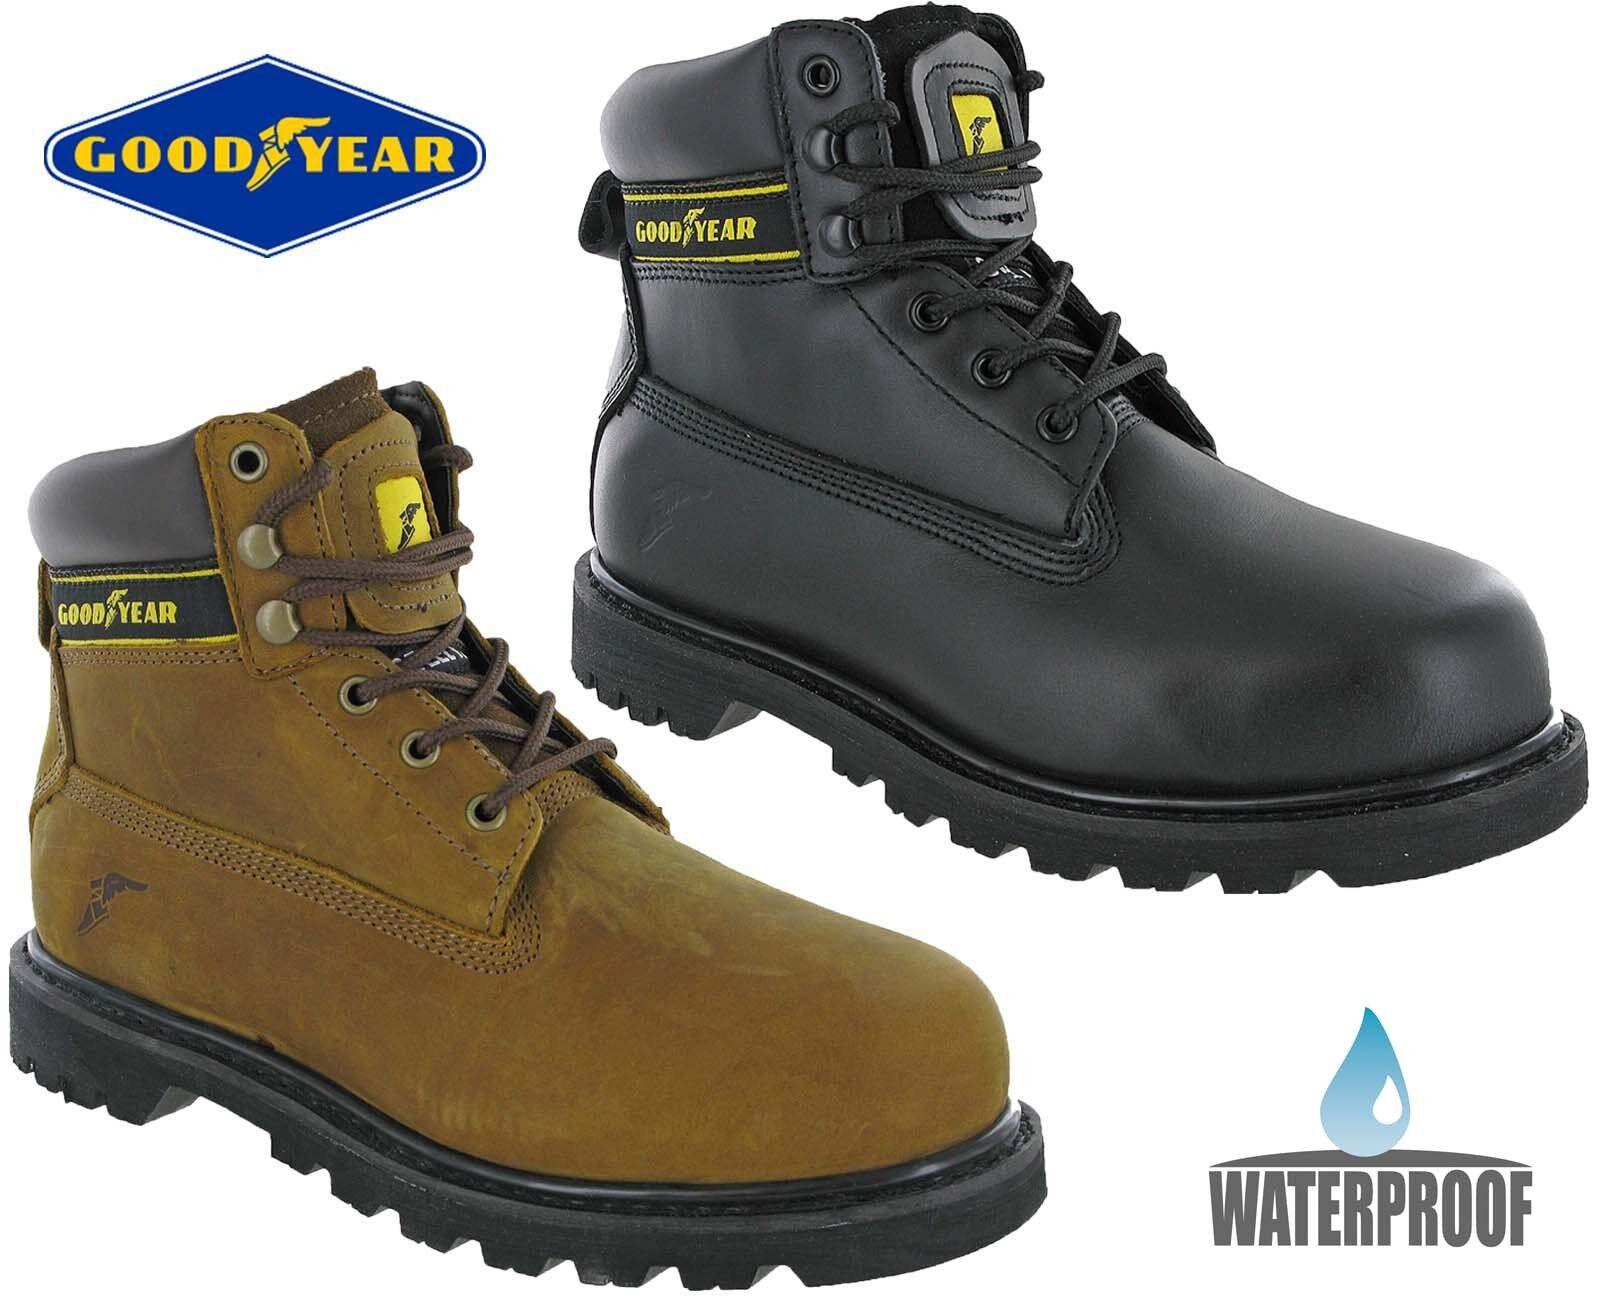 Goodyear Safety Work Boots Waterproof